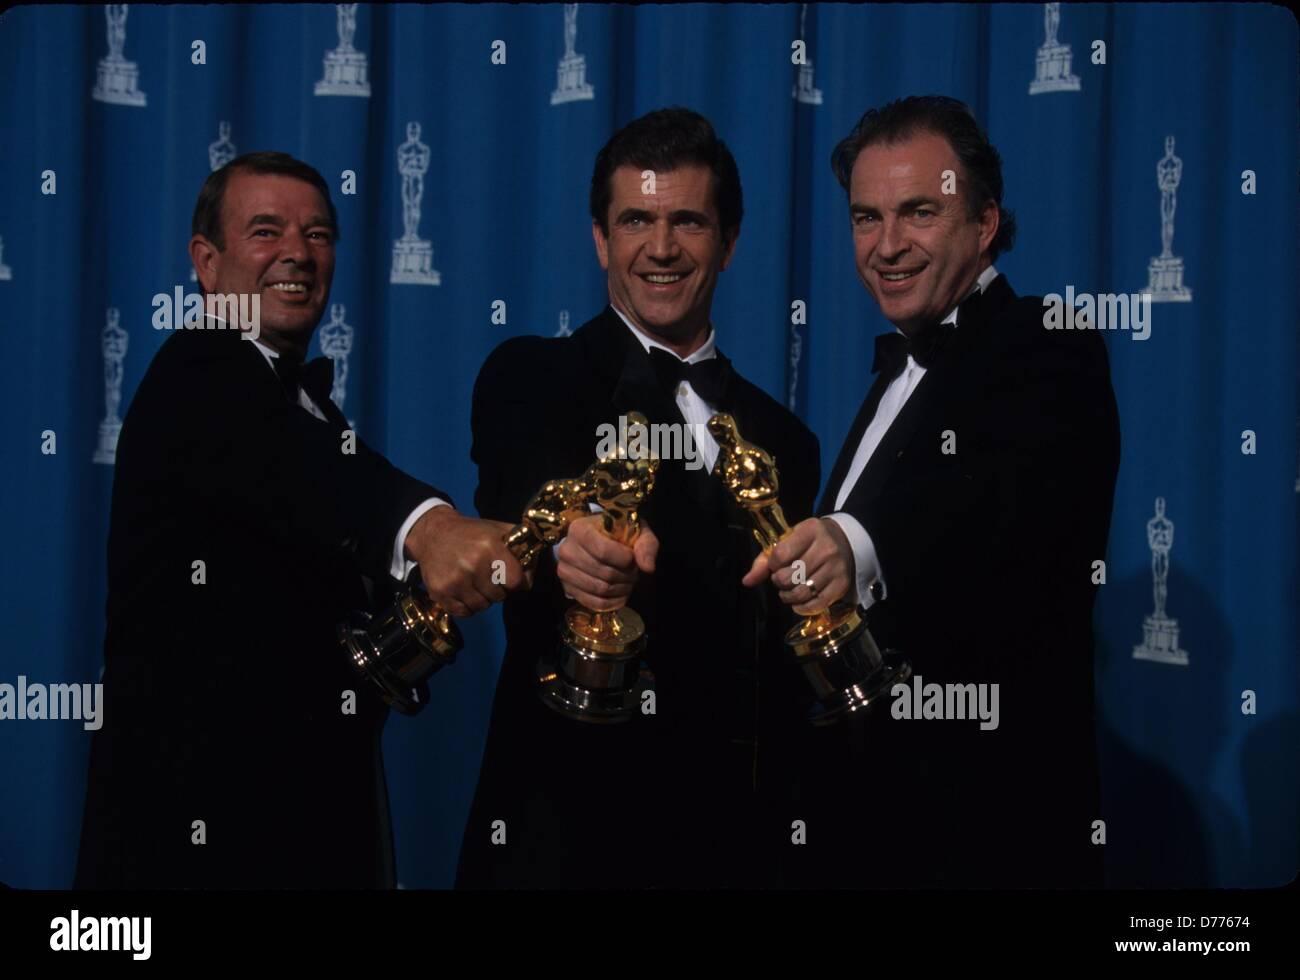 68th annual academy awards - HD1300×980